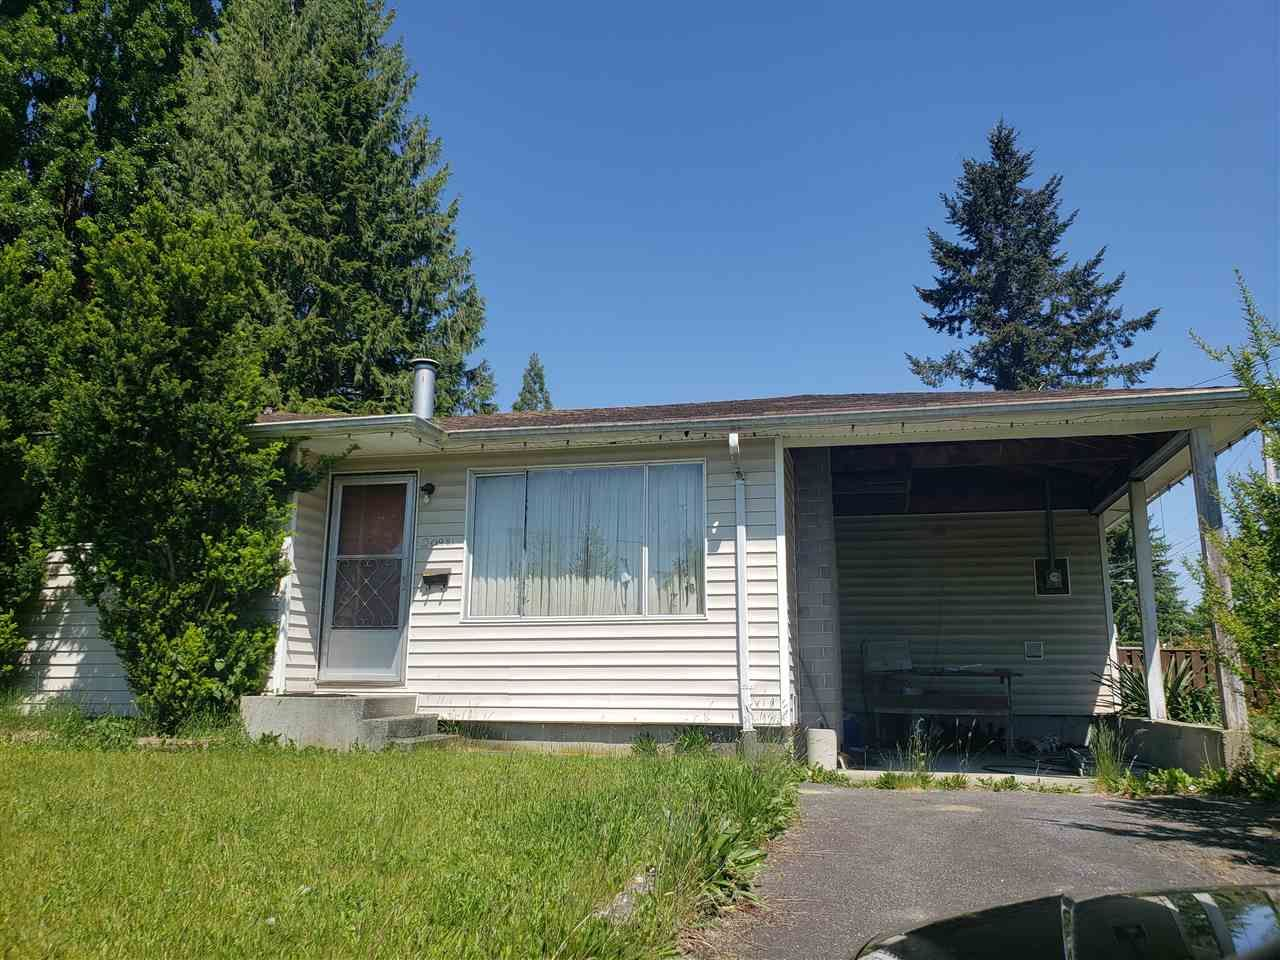 Main Photo: 20981 116 Avenue in Maple Ridge: Southwest Maple Ridge House for sale : MLS®# R2587964